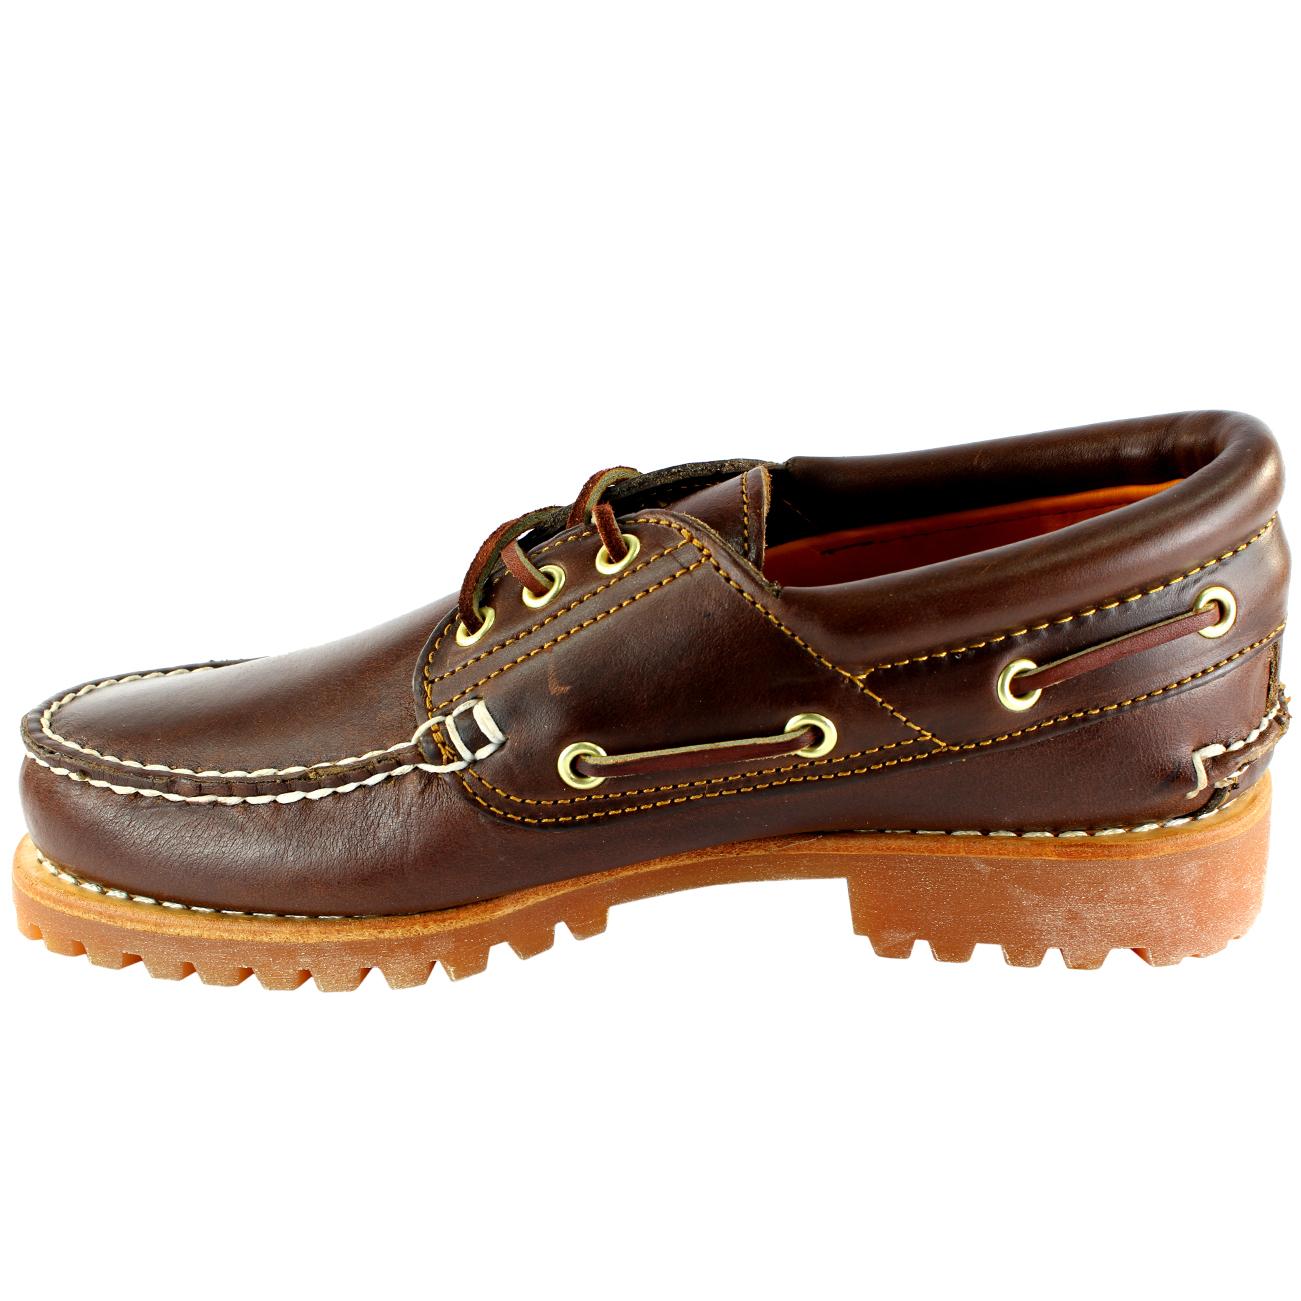 Timberland Classic Boat Shoe Mens